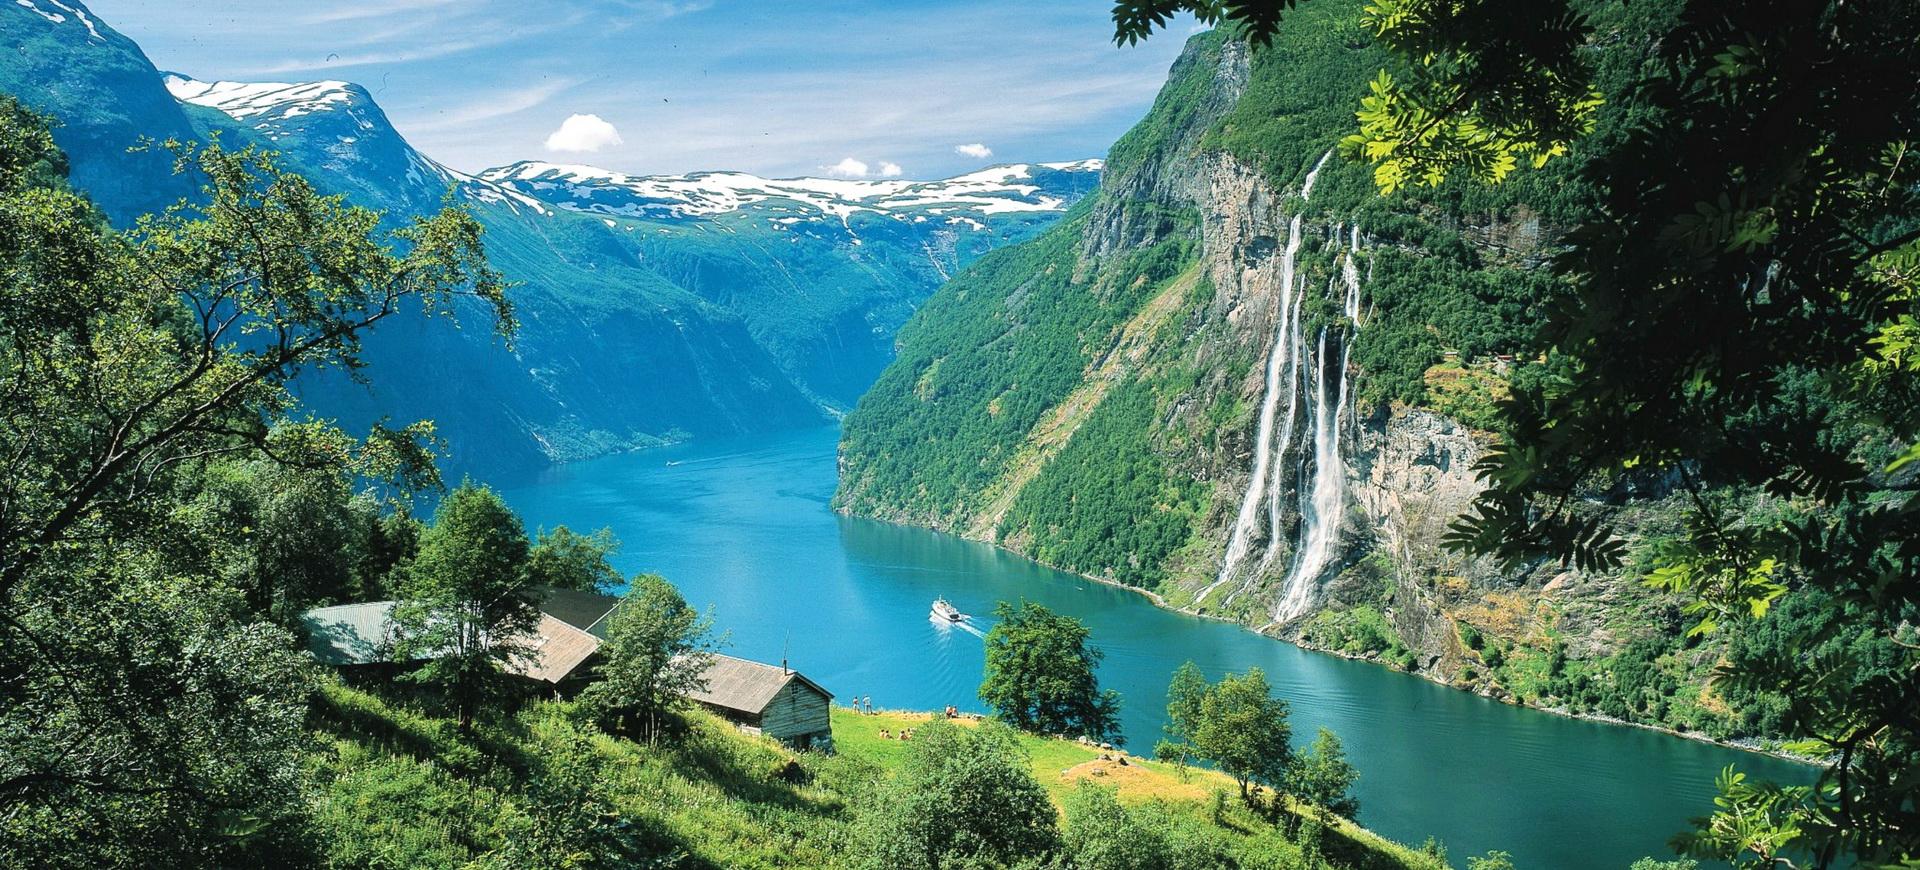 Formalités visa Norvège